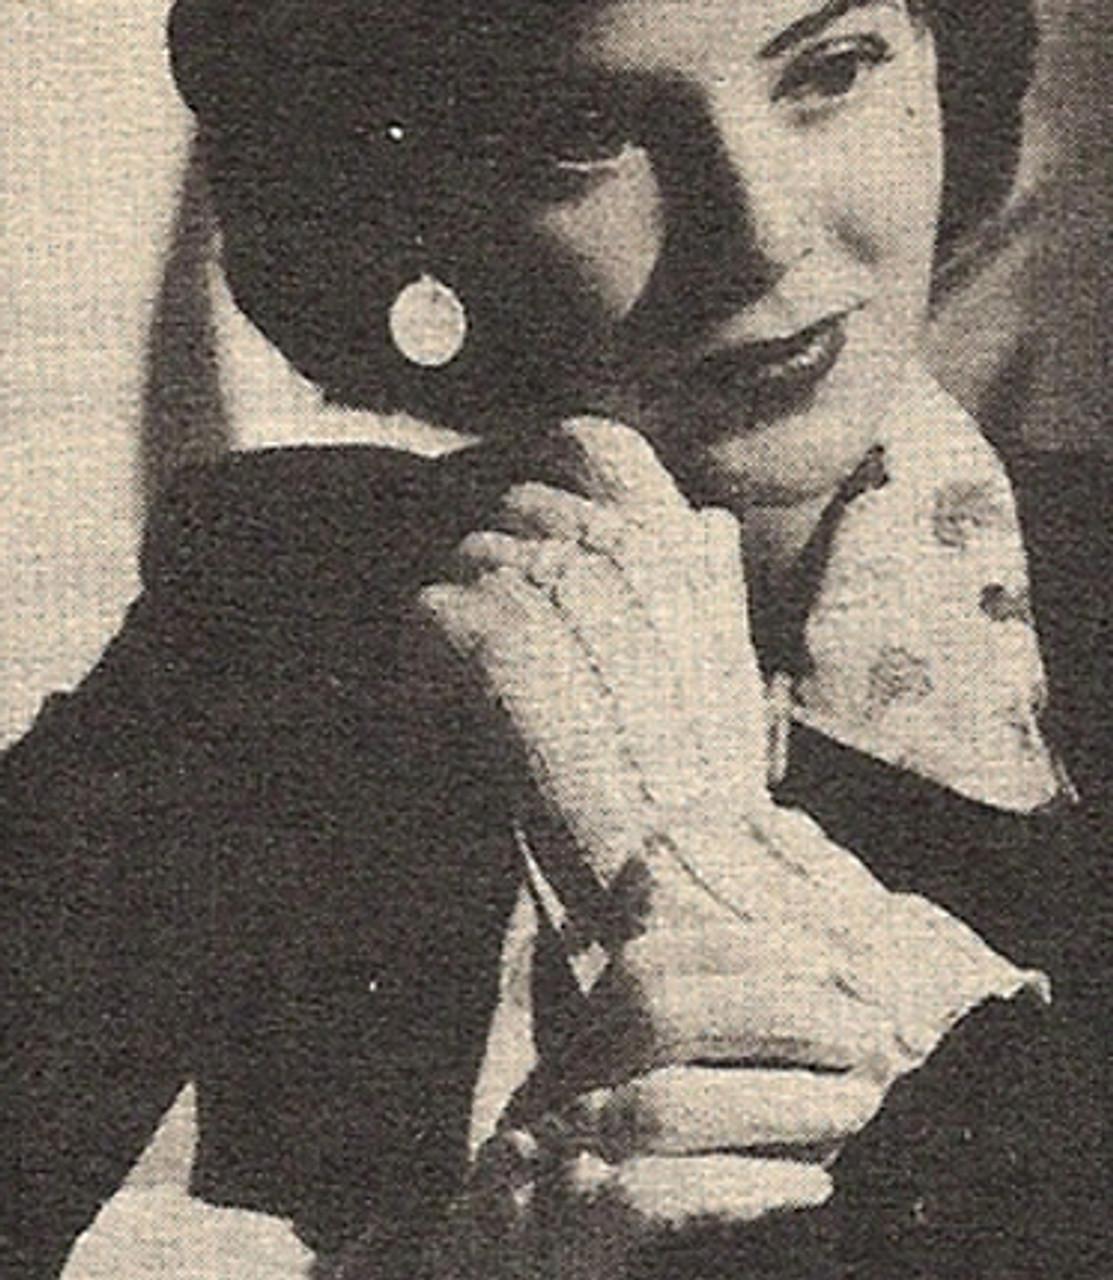 Knitting Pattern for Misses Gloves, Vintage 1950